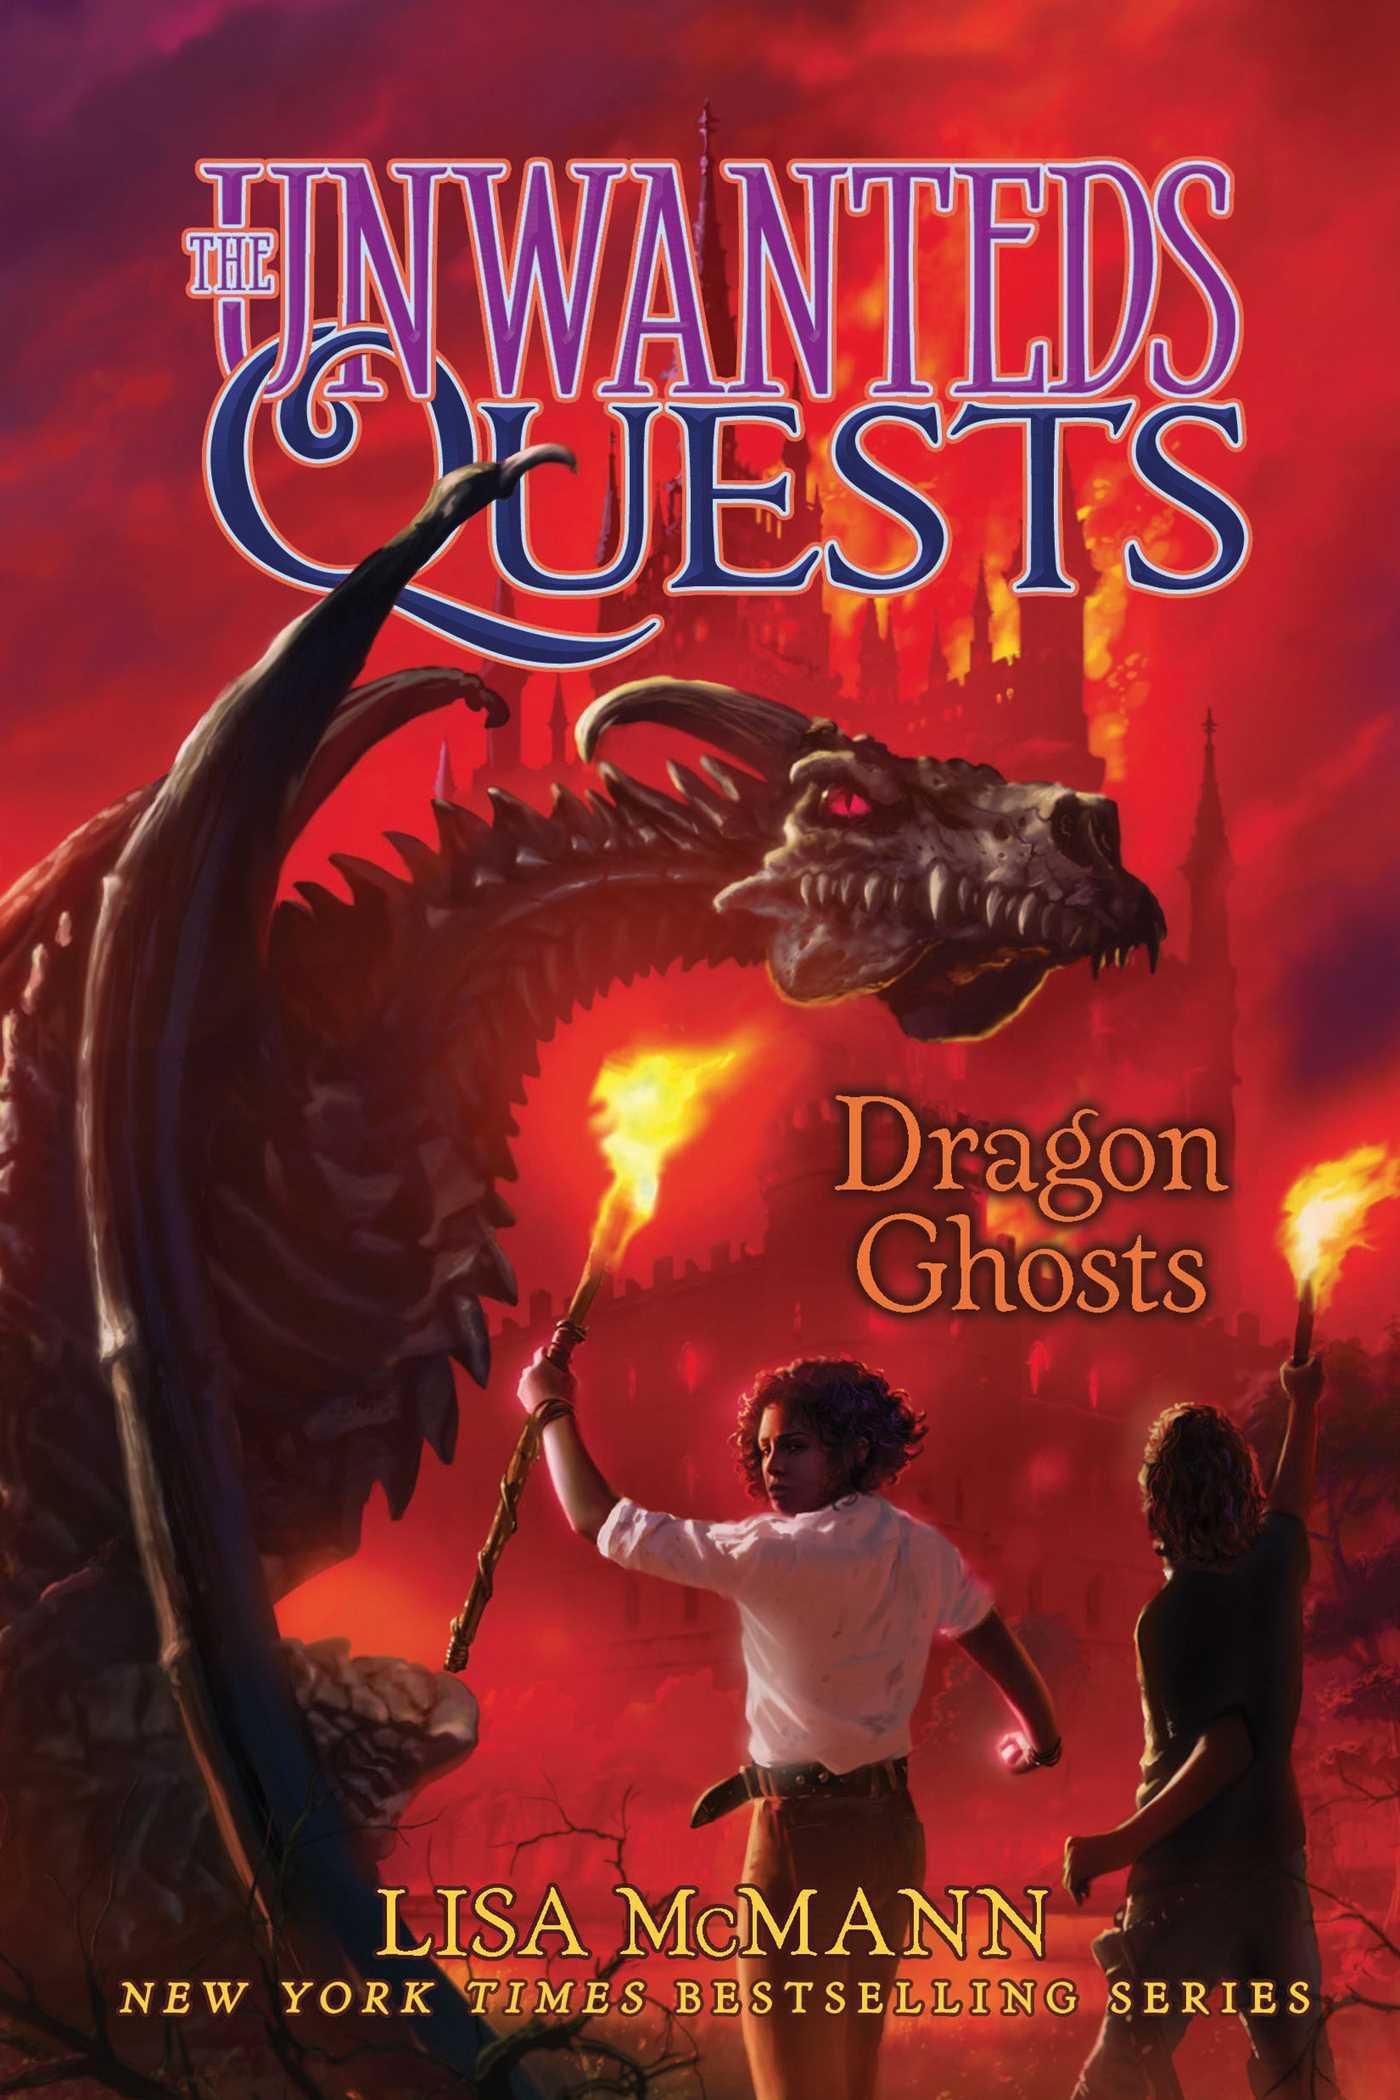 Dragon ghosts 9781534415980 hr